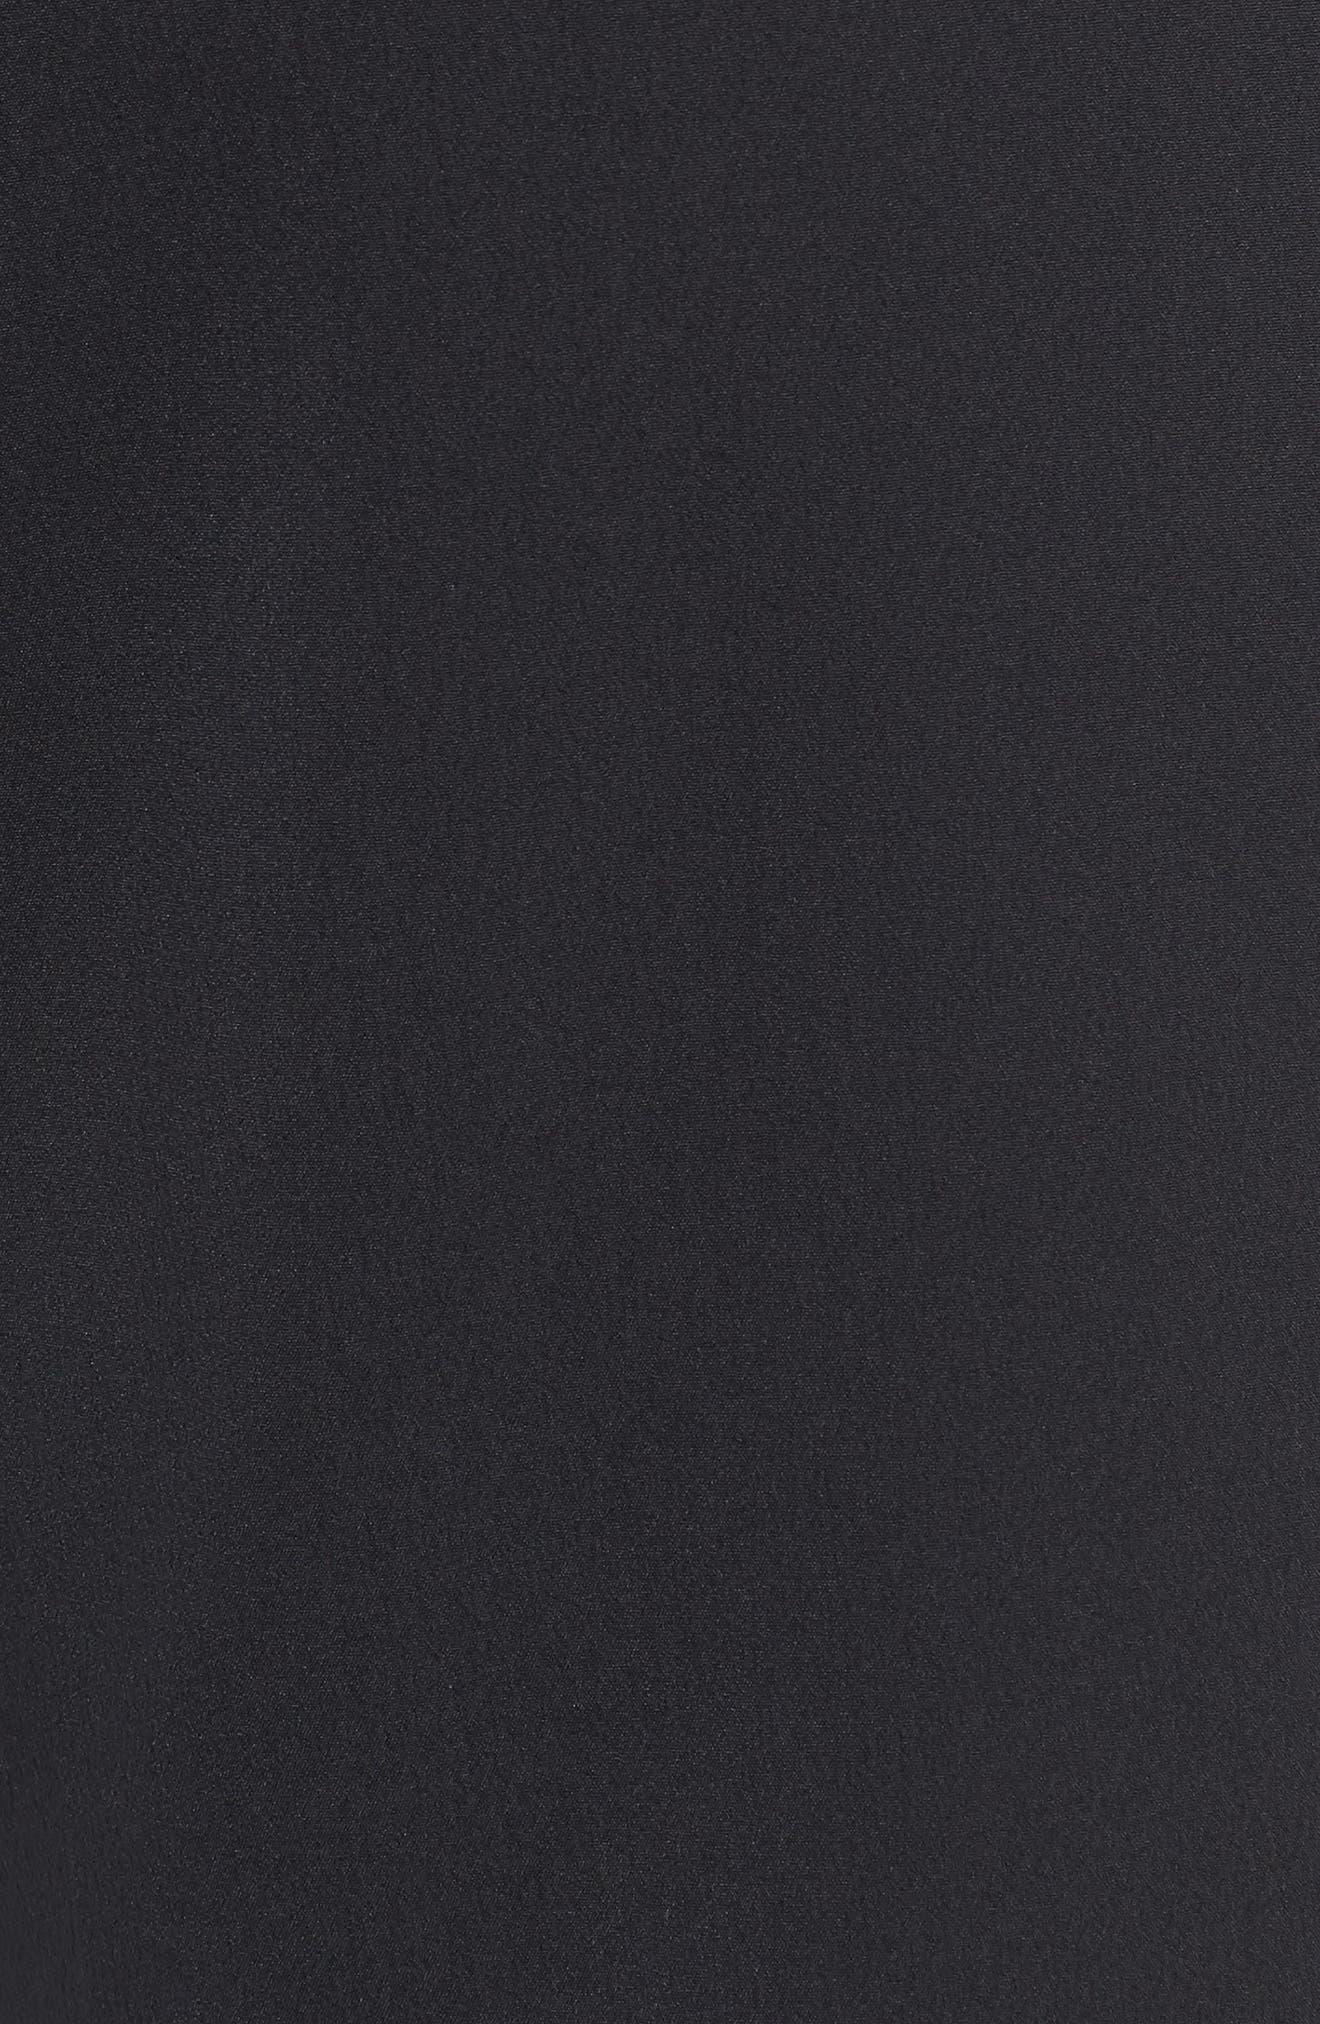 Dry Flex Slim Fit Golf Shorts,                             Alternate thumbnail 5, color,                             Black/ Black